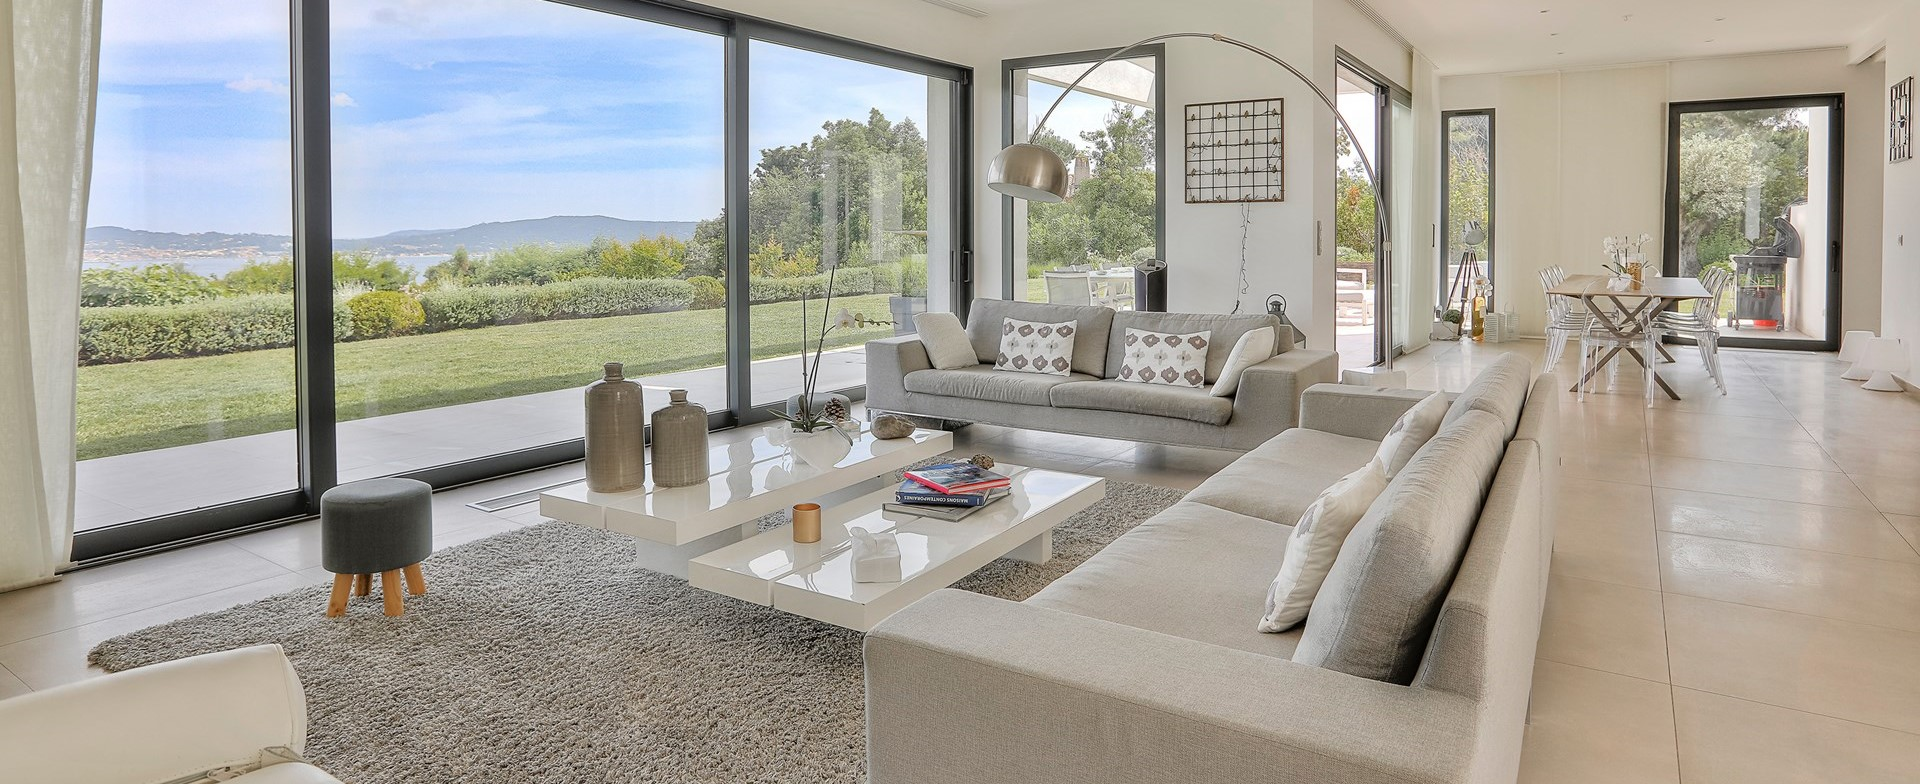 villa-grimaud-open-plan-interior